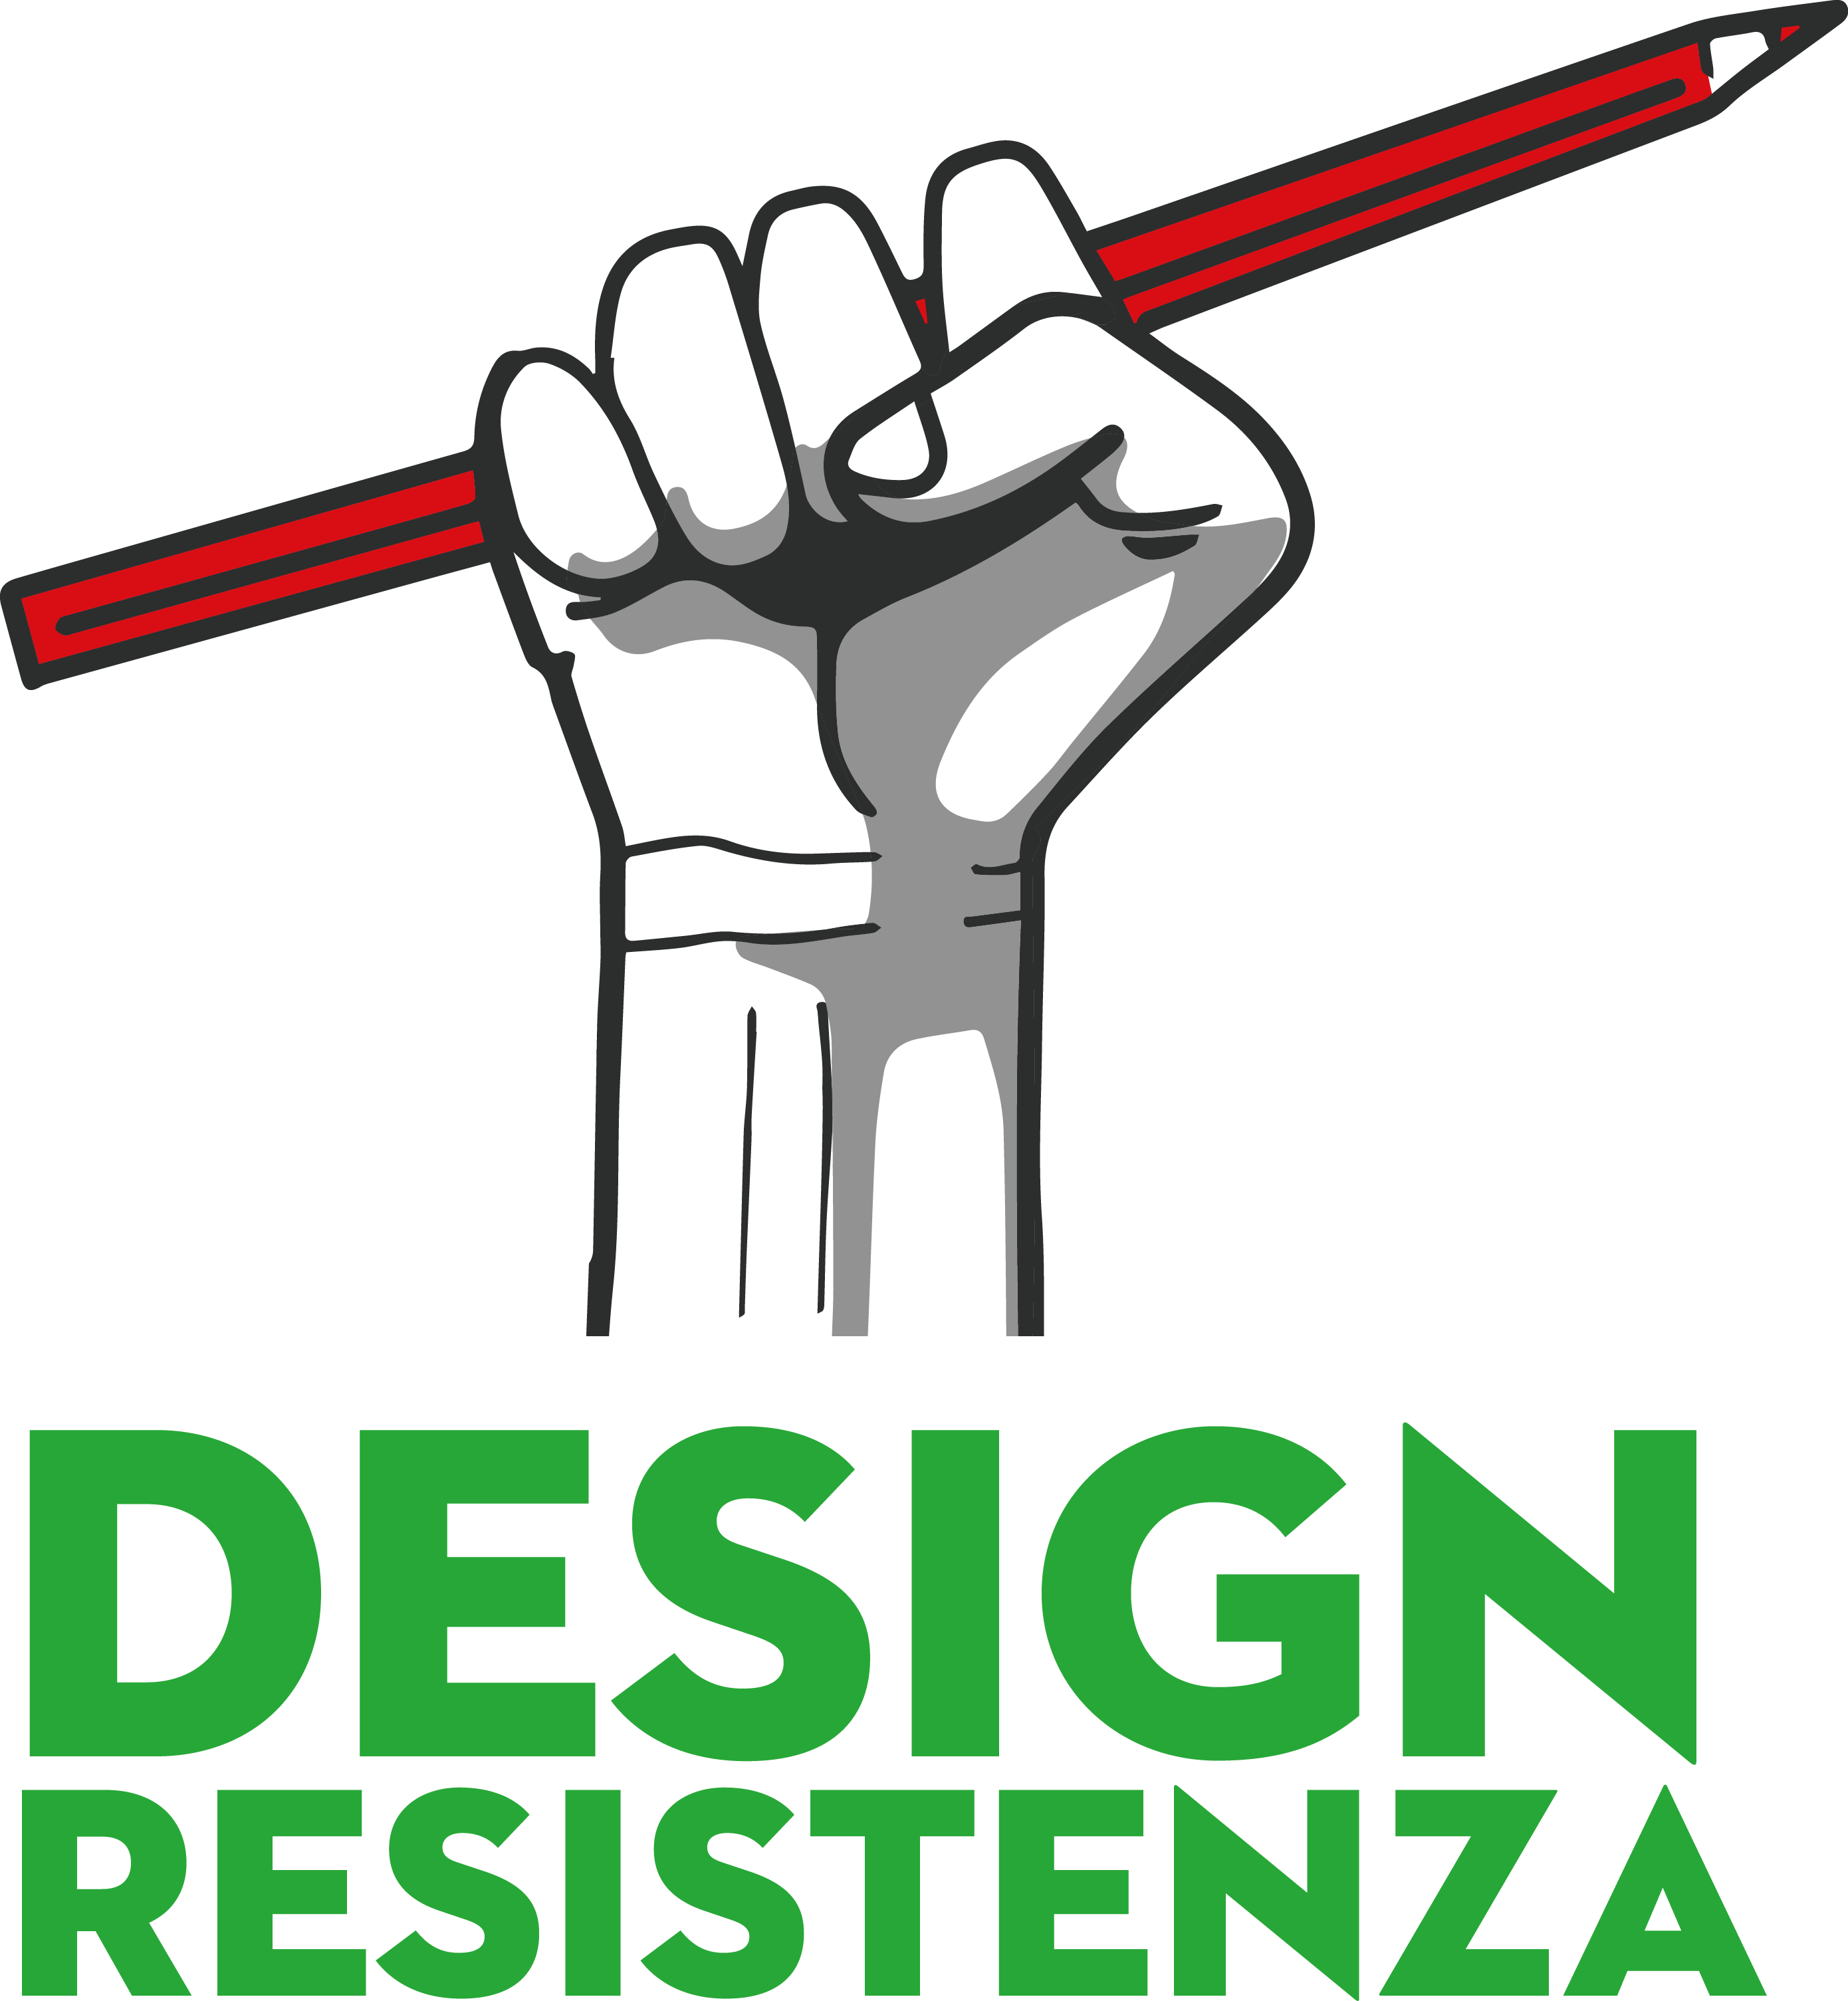 DESIGN RESISTENZA